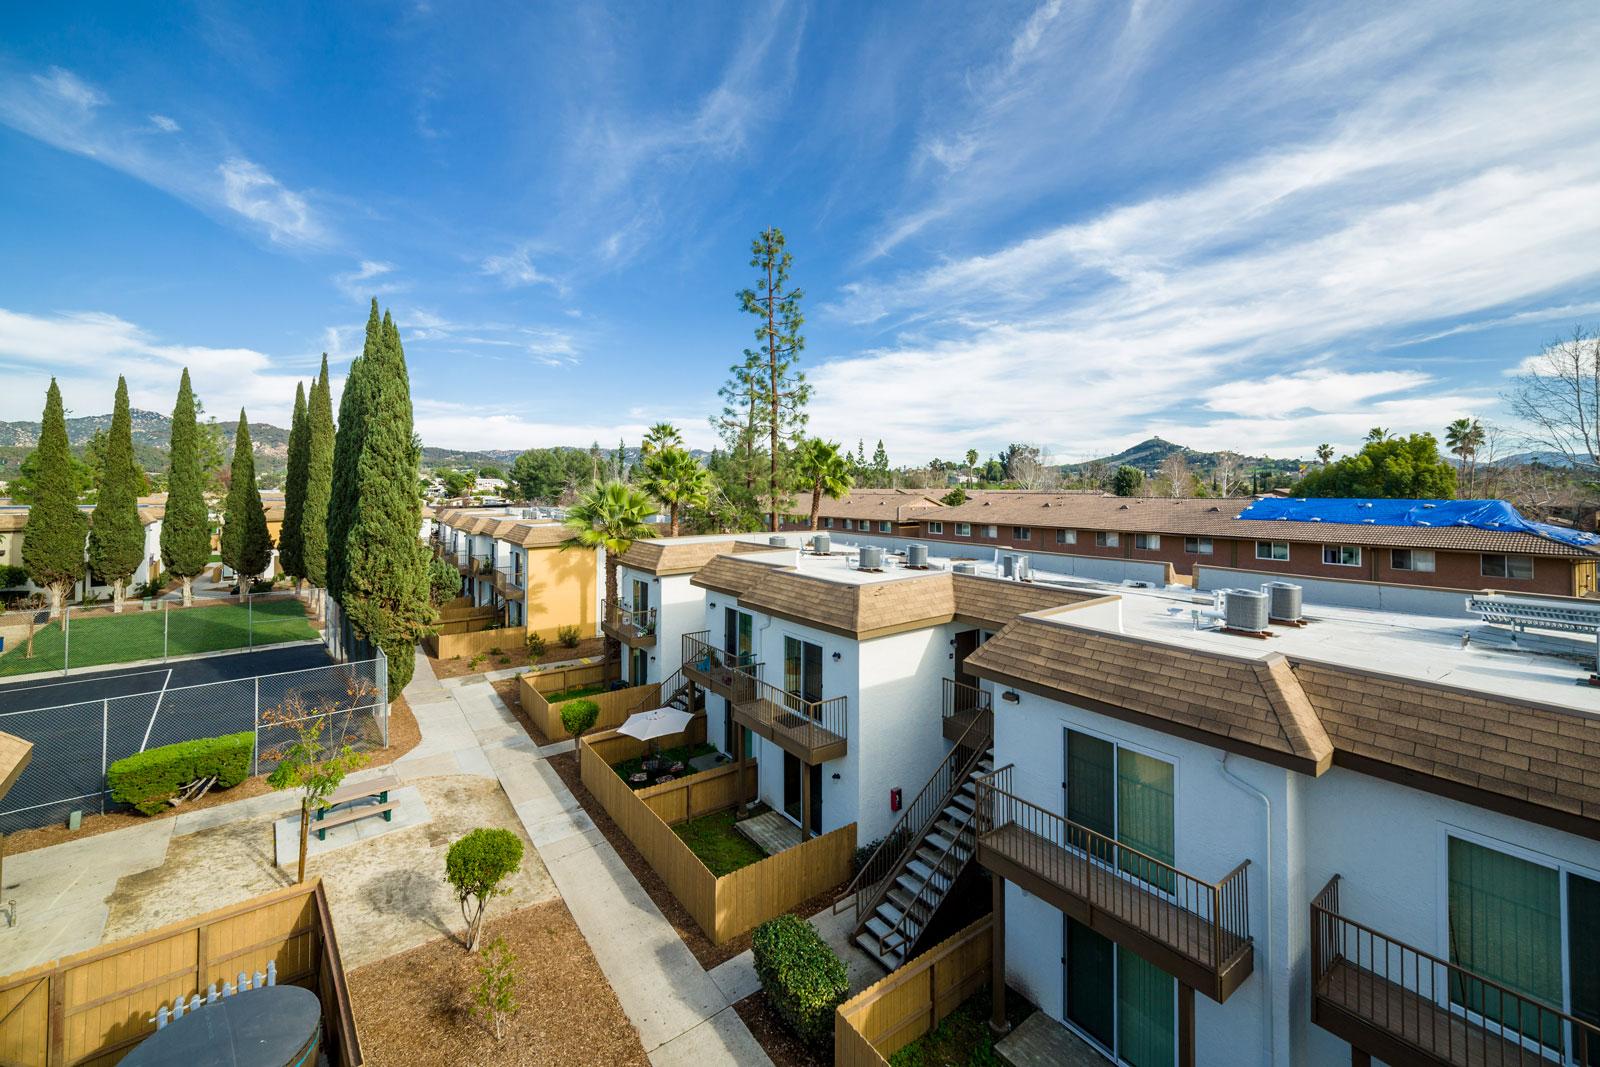 Image of Manzanita Apartments in Escondido, California